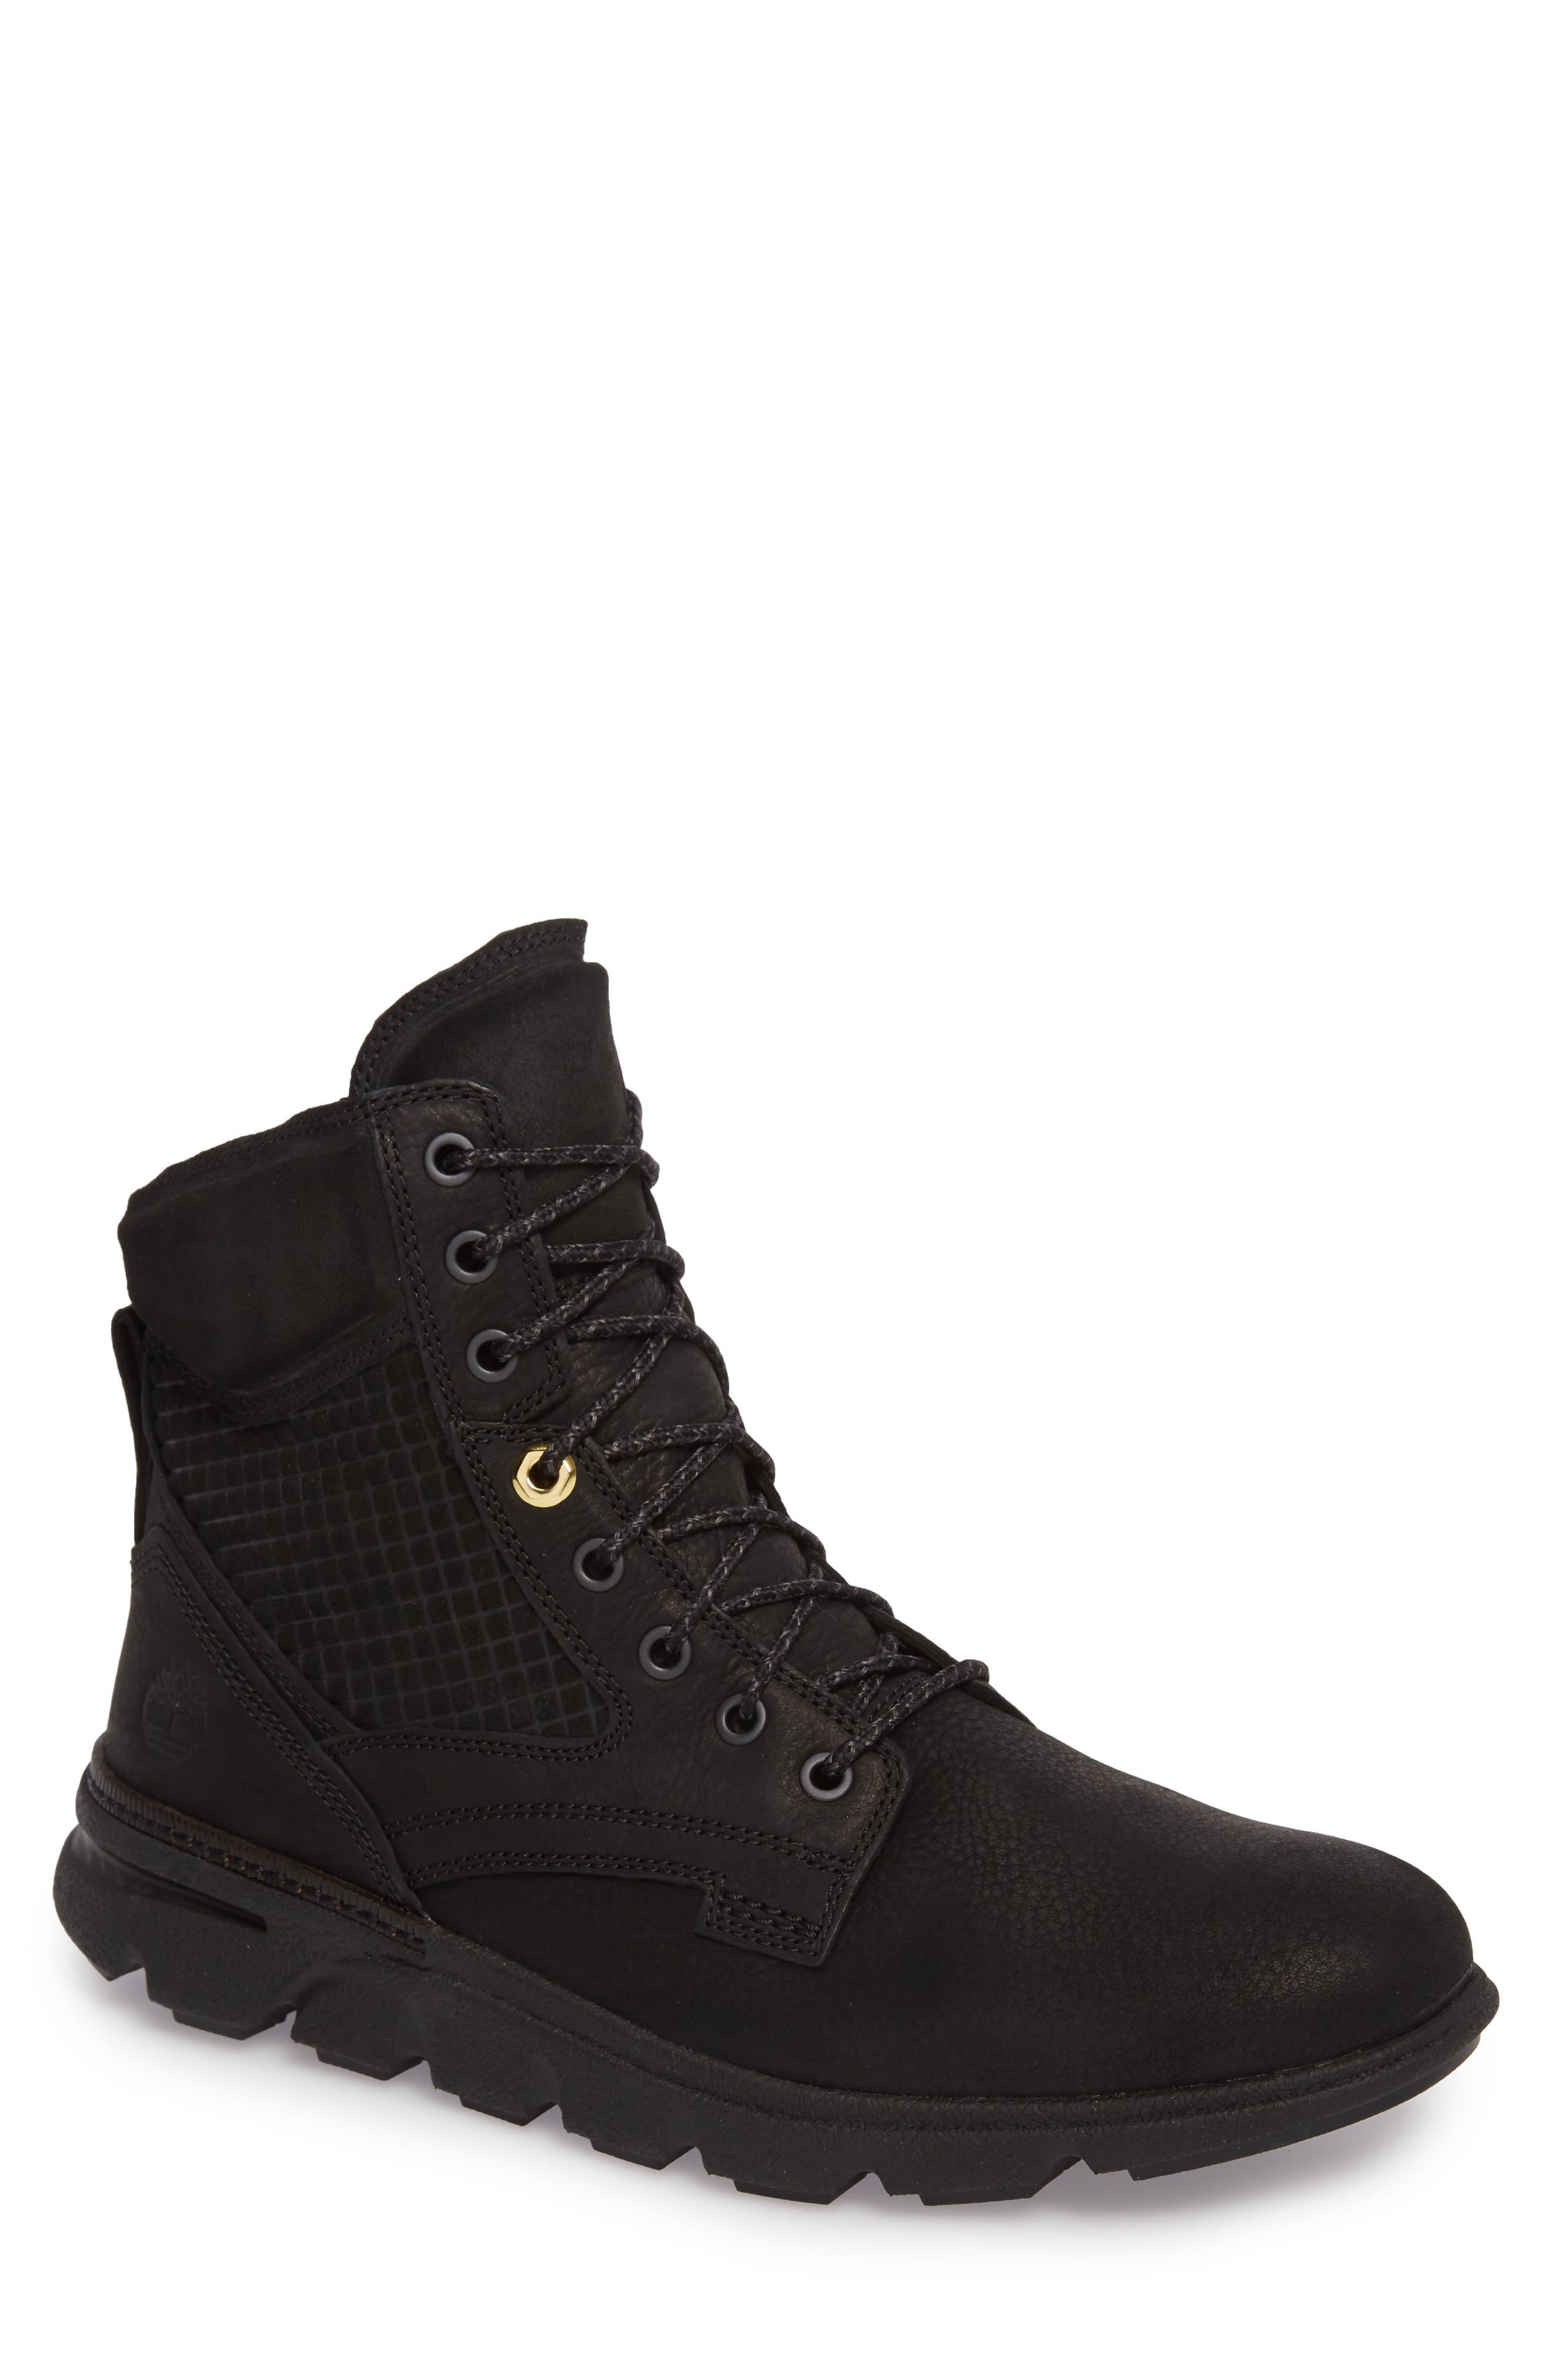 Eagle Lace-Up Boot,                             Main thumbnail 1, color,                             Jet Black Leather